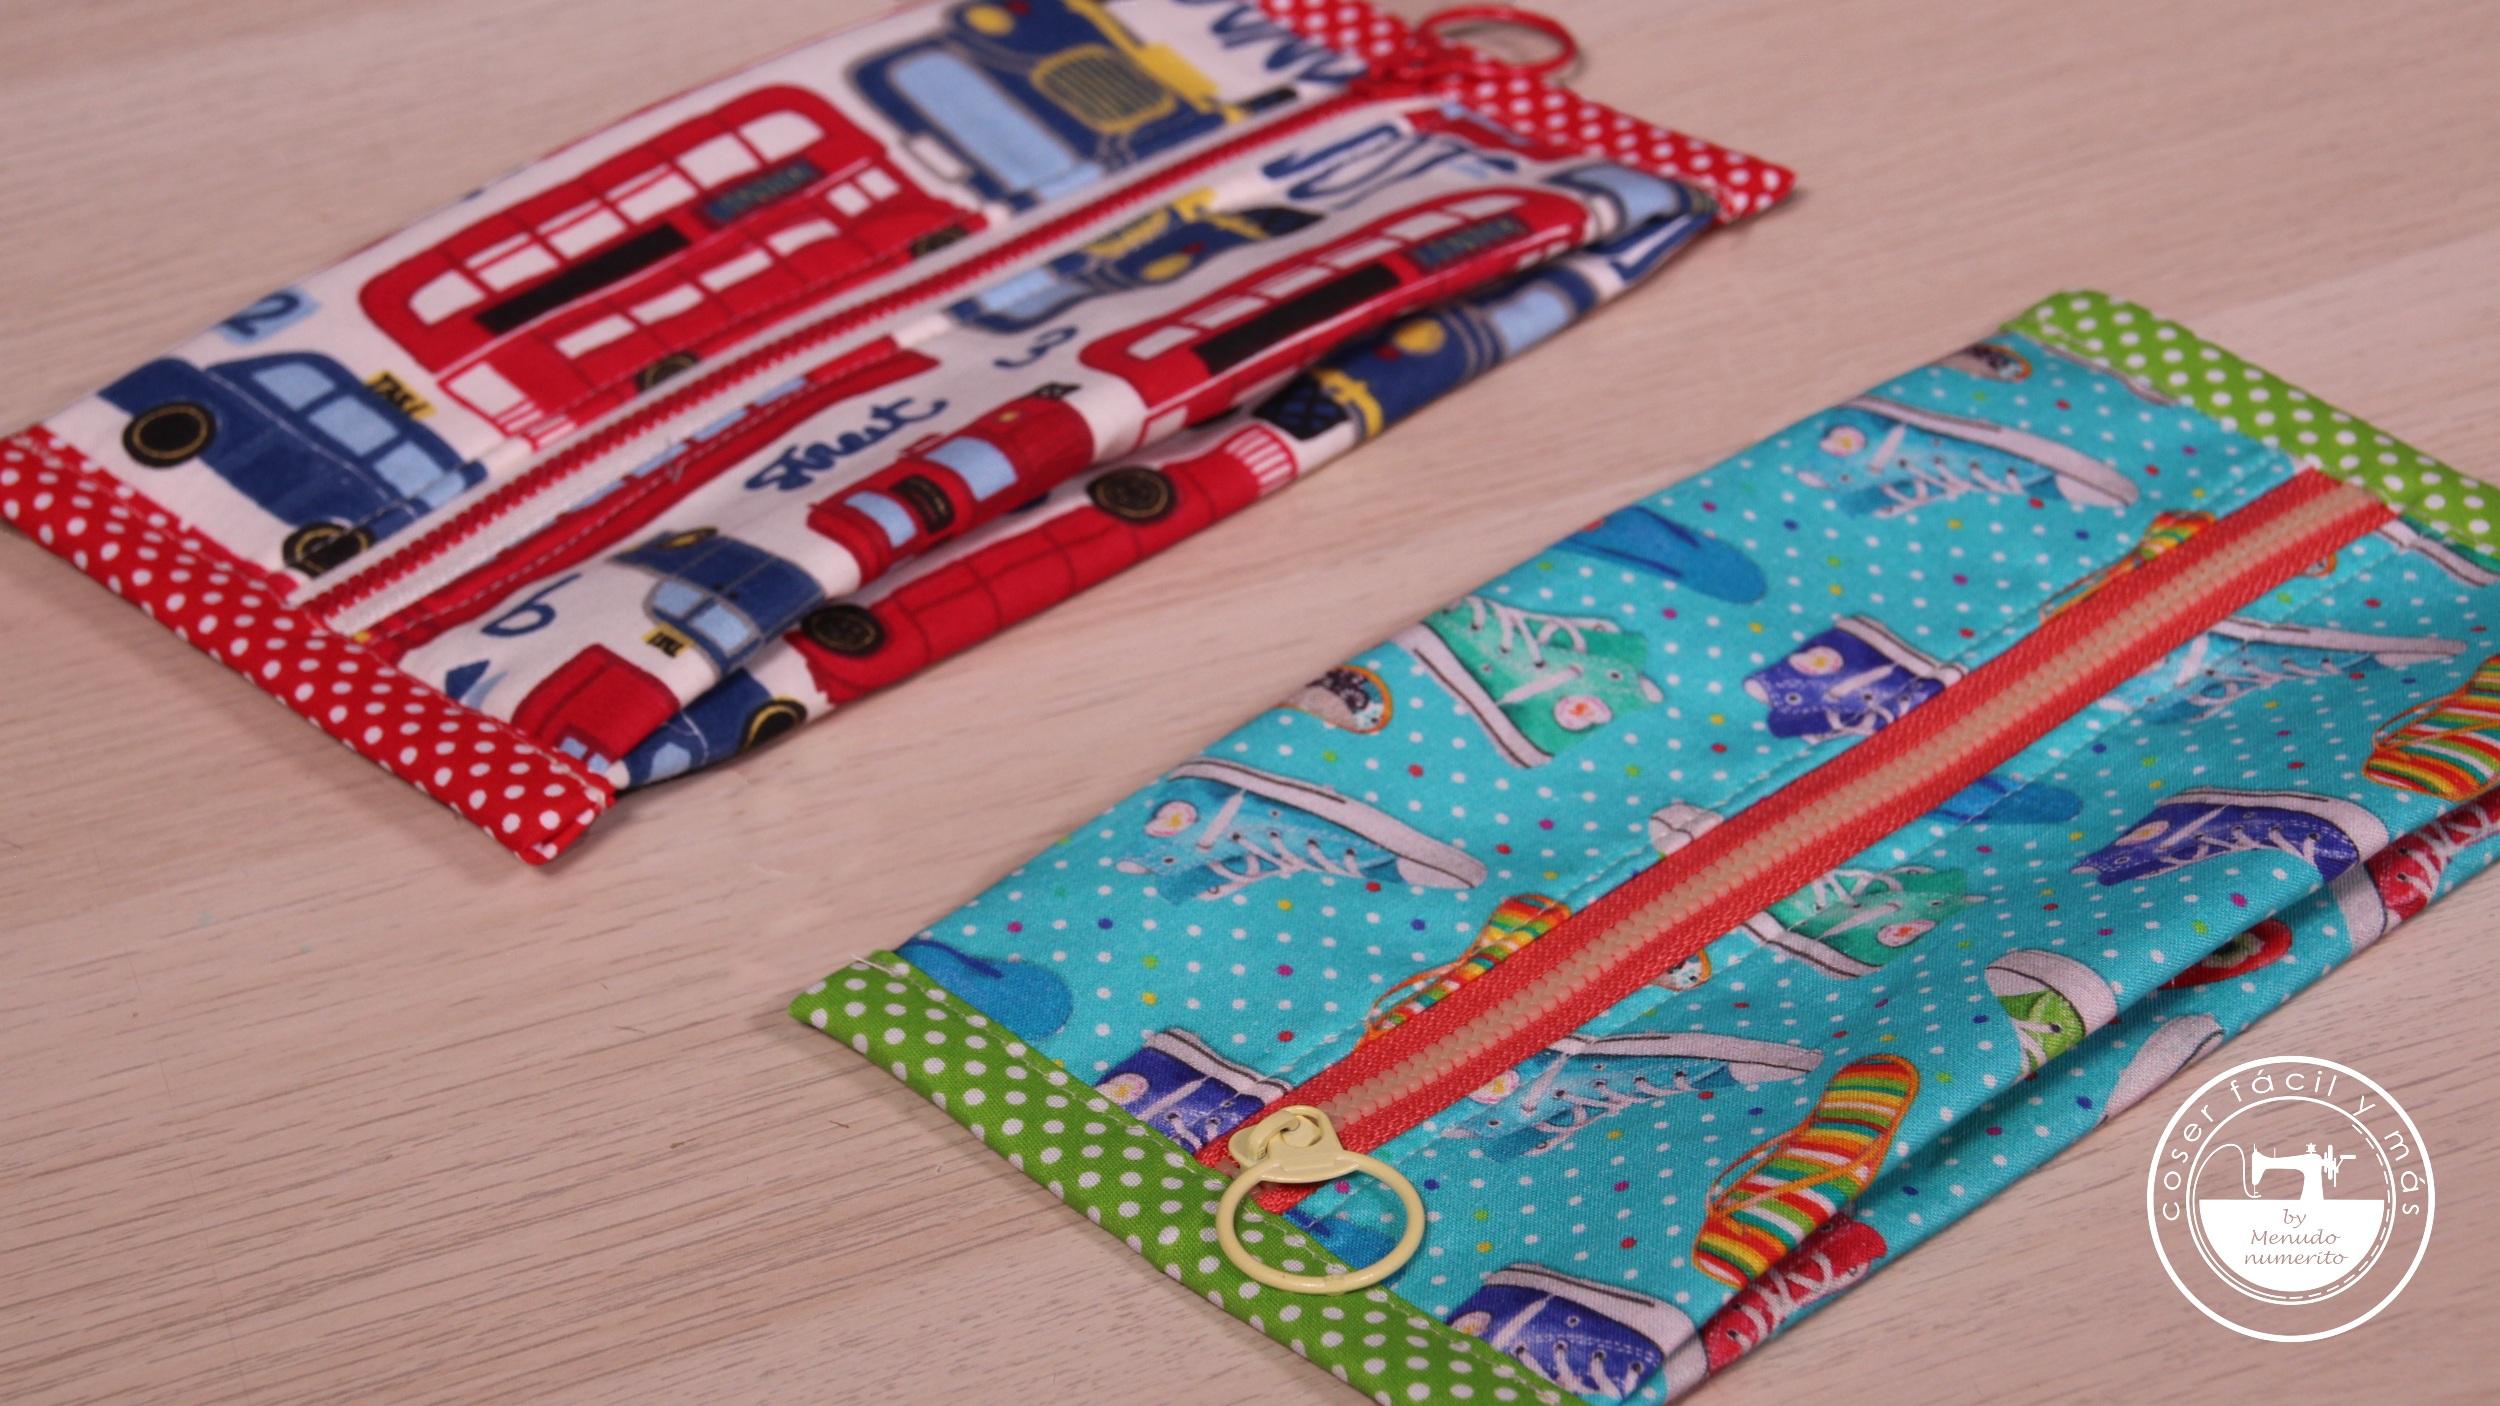 estuche bolsa de palomitas estuche coser facil menudo numerito blgos de costura tutorial